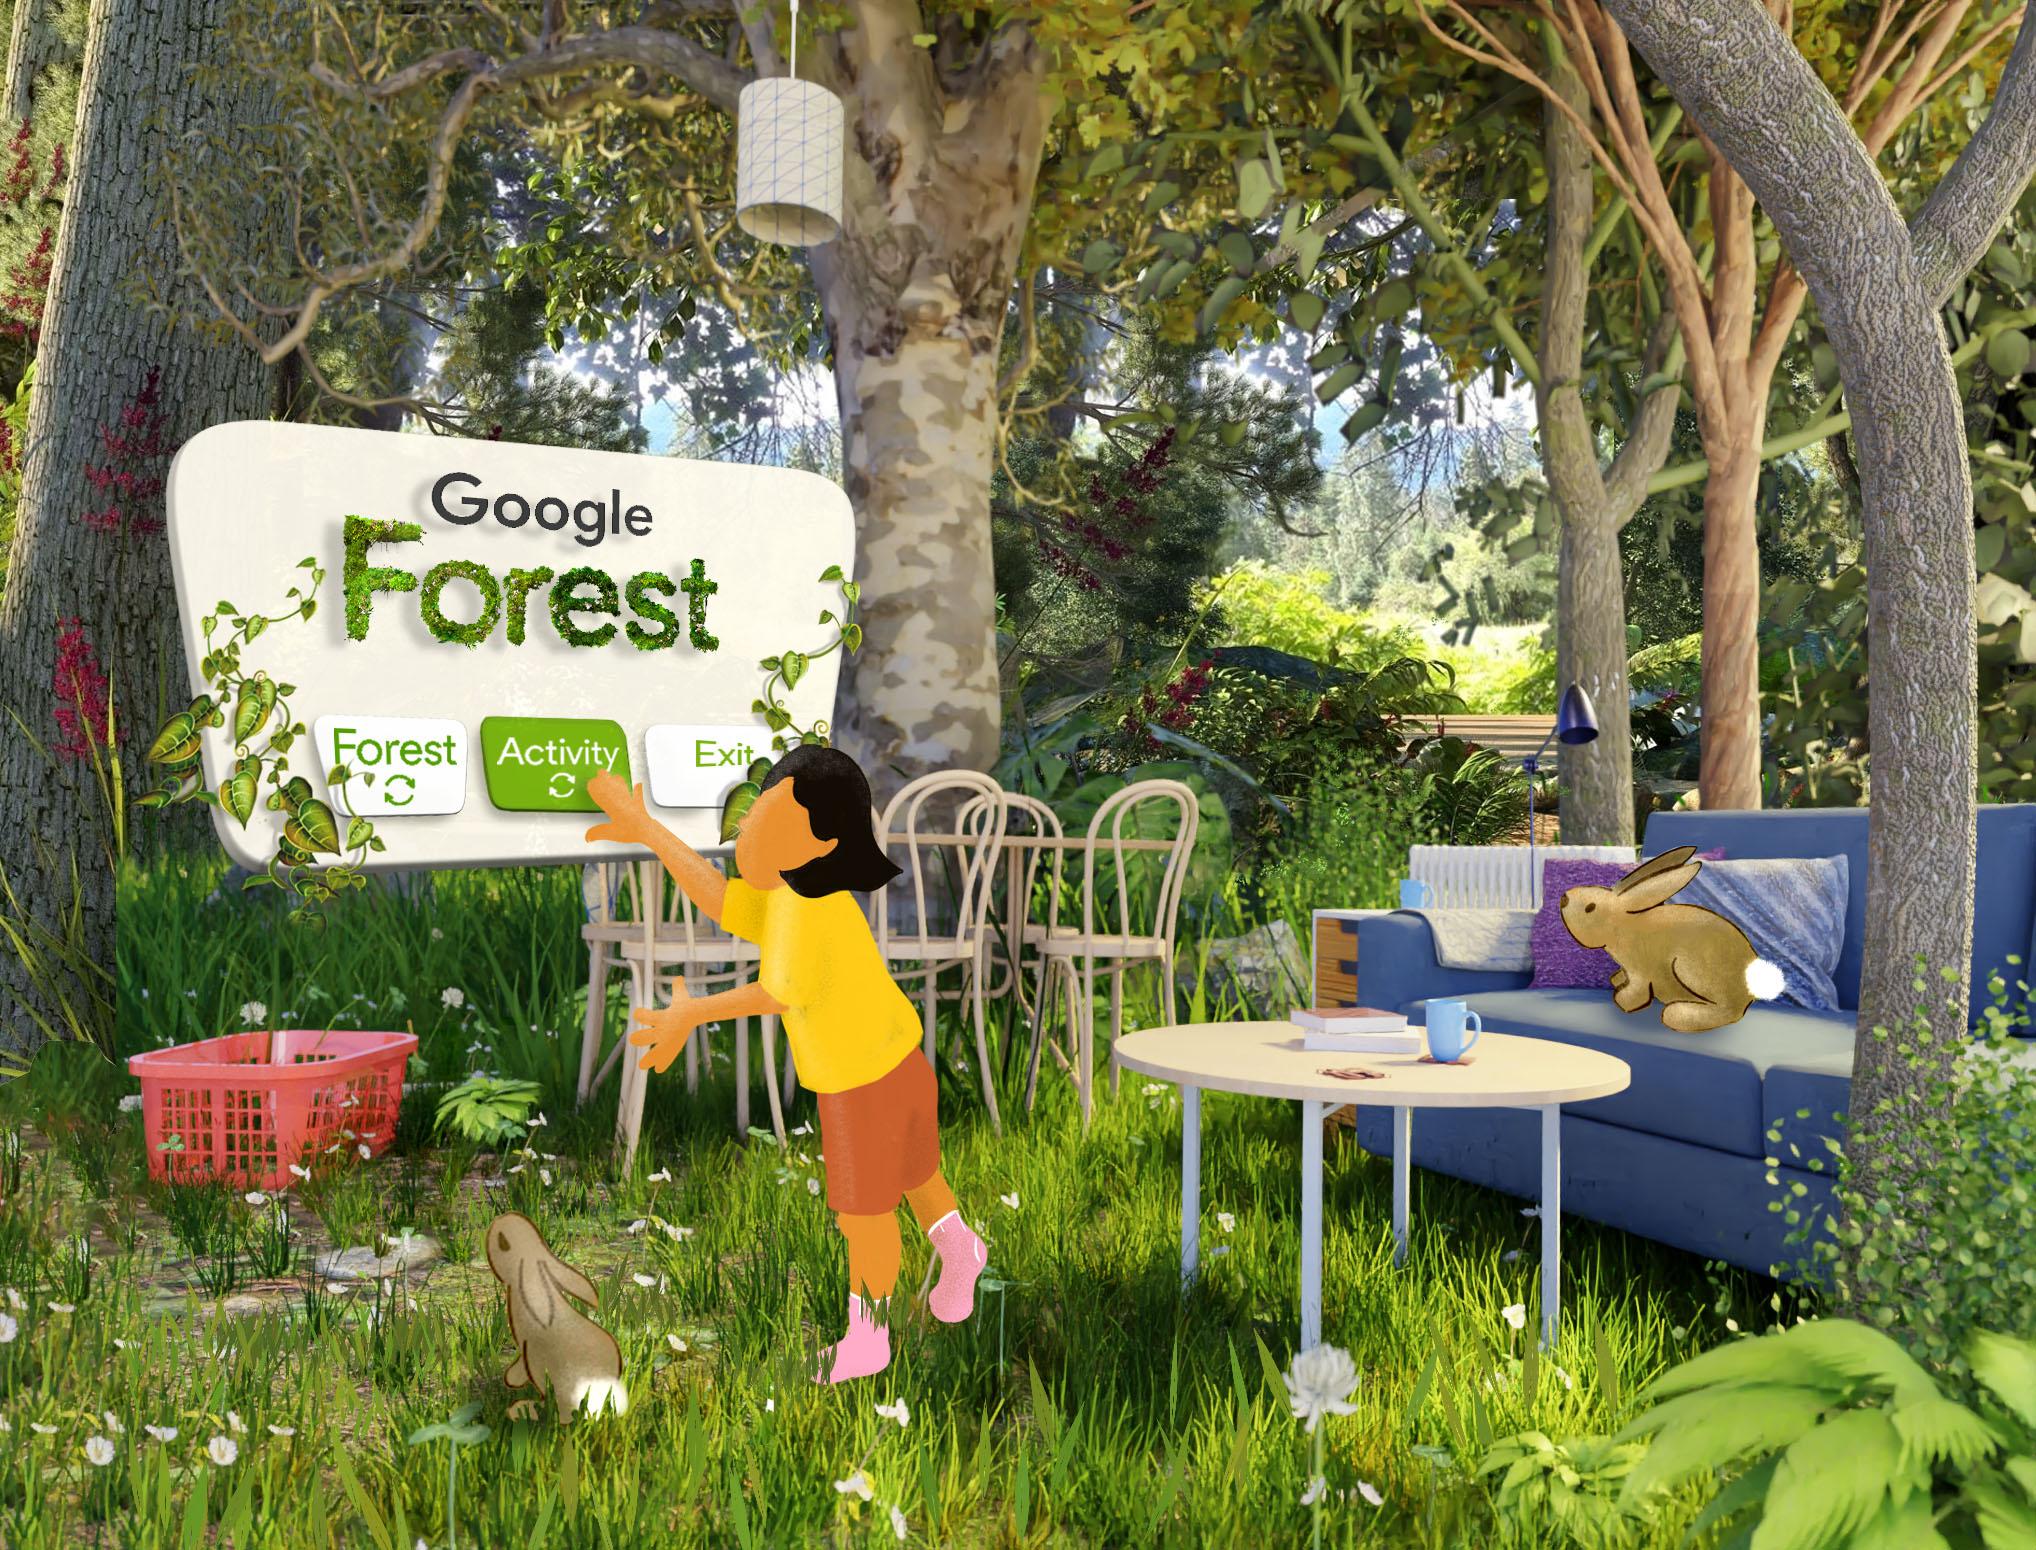 Google Forest main screen